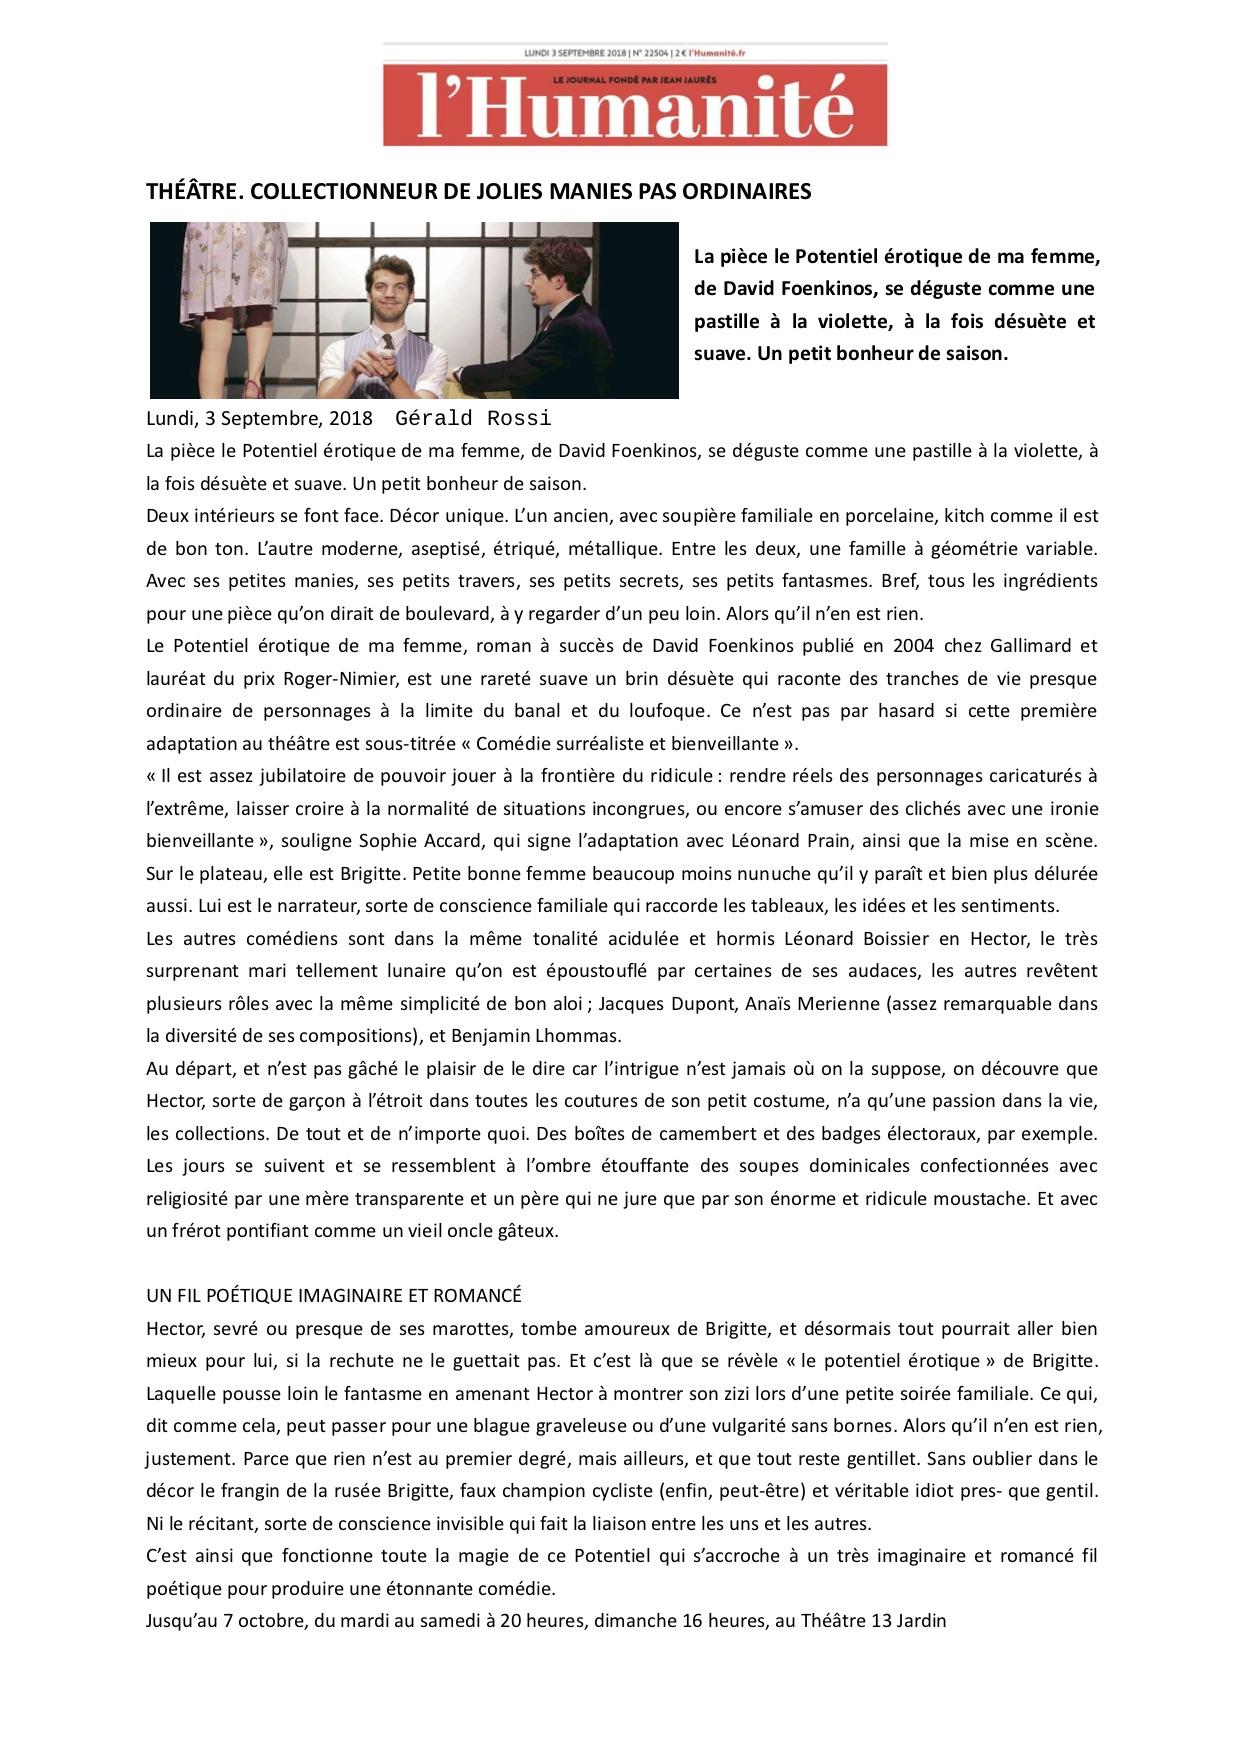 LHUMA.fr 03.09.18